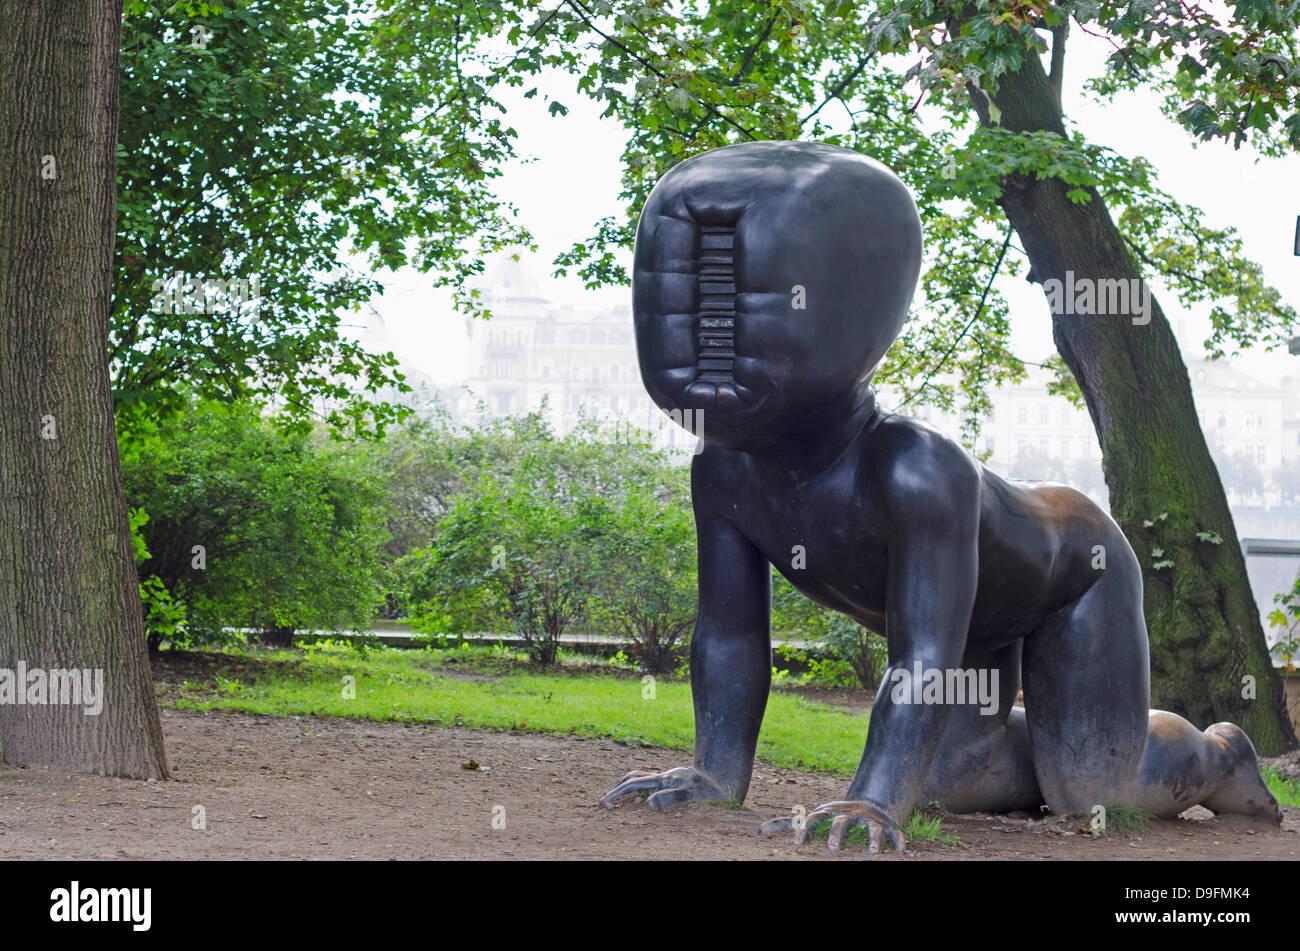 Babies statue by David Cerny at the Kampa Art Museum, Prague, Czech Republic - Stock Image